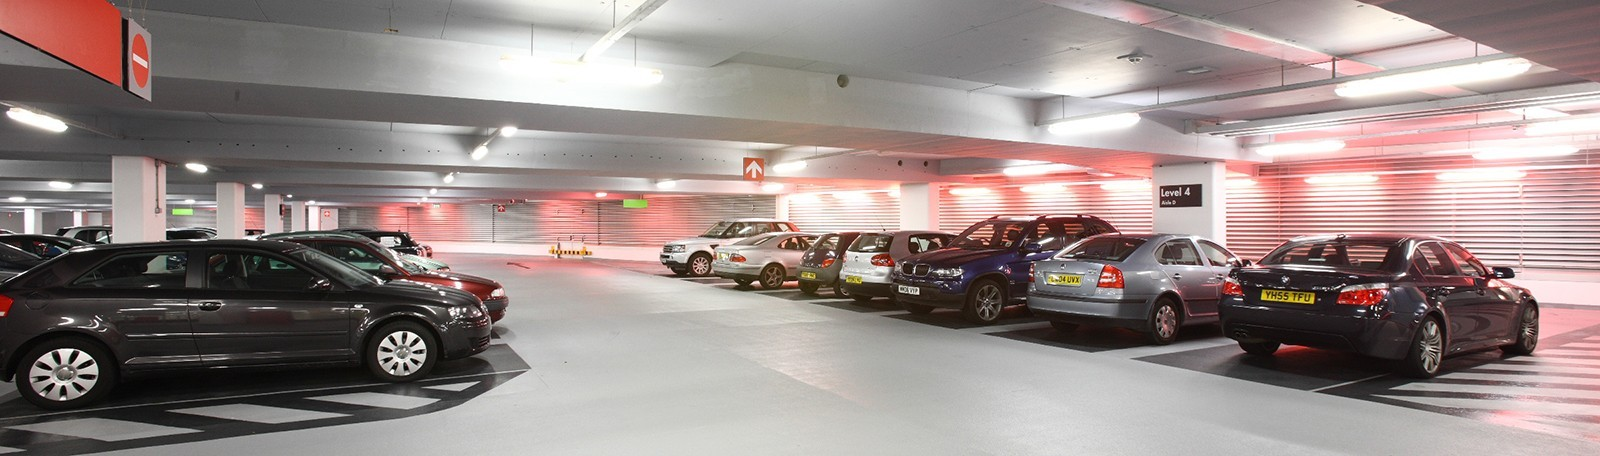 Réservation parking gare Valence